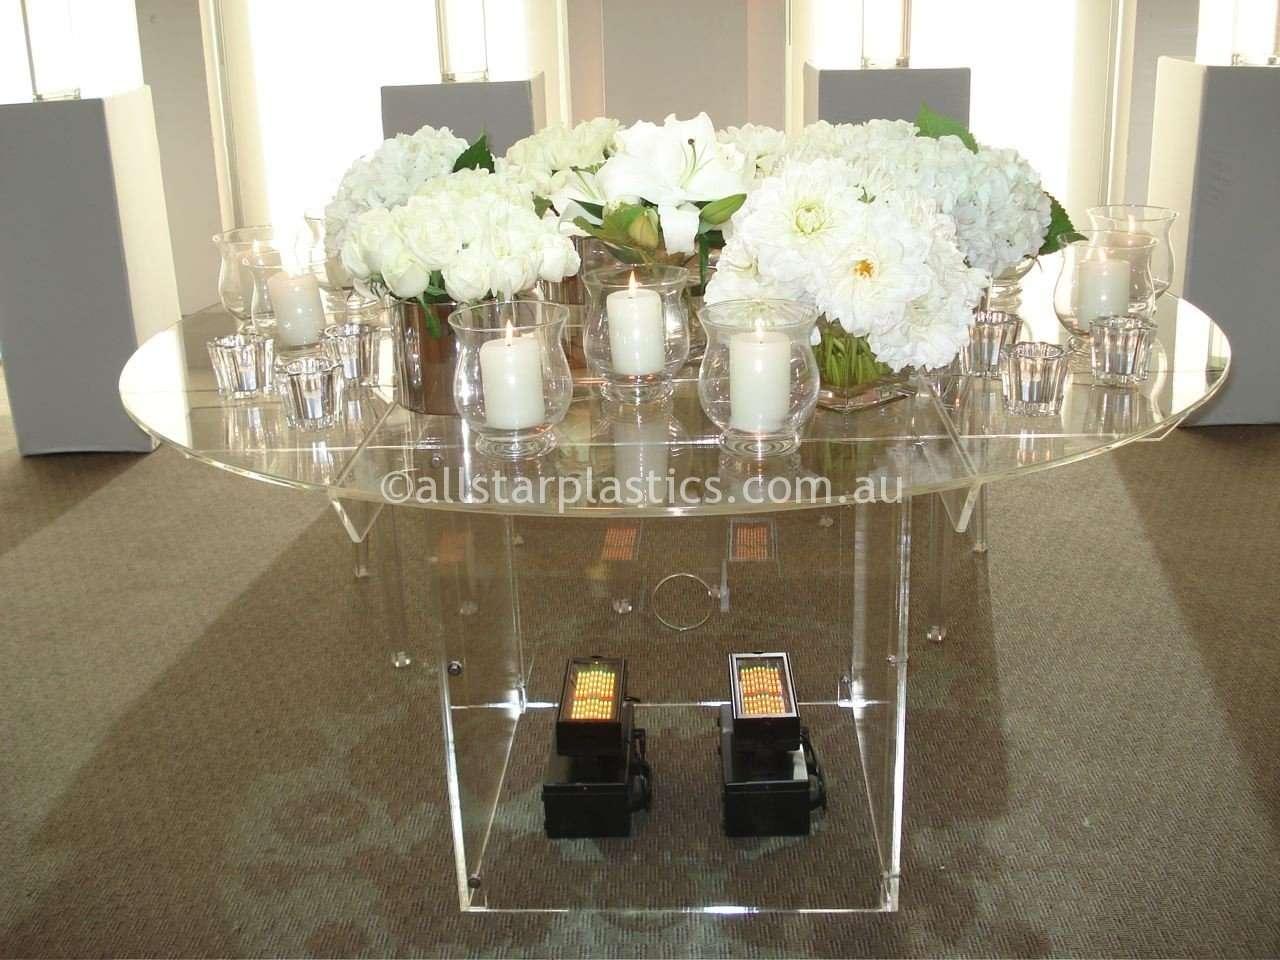 Acrylic Table Wedding - light setup underneath.